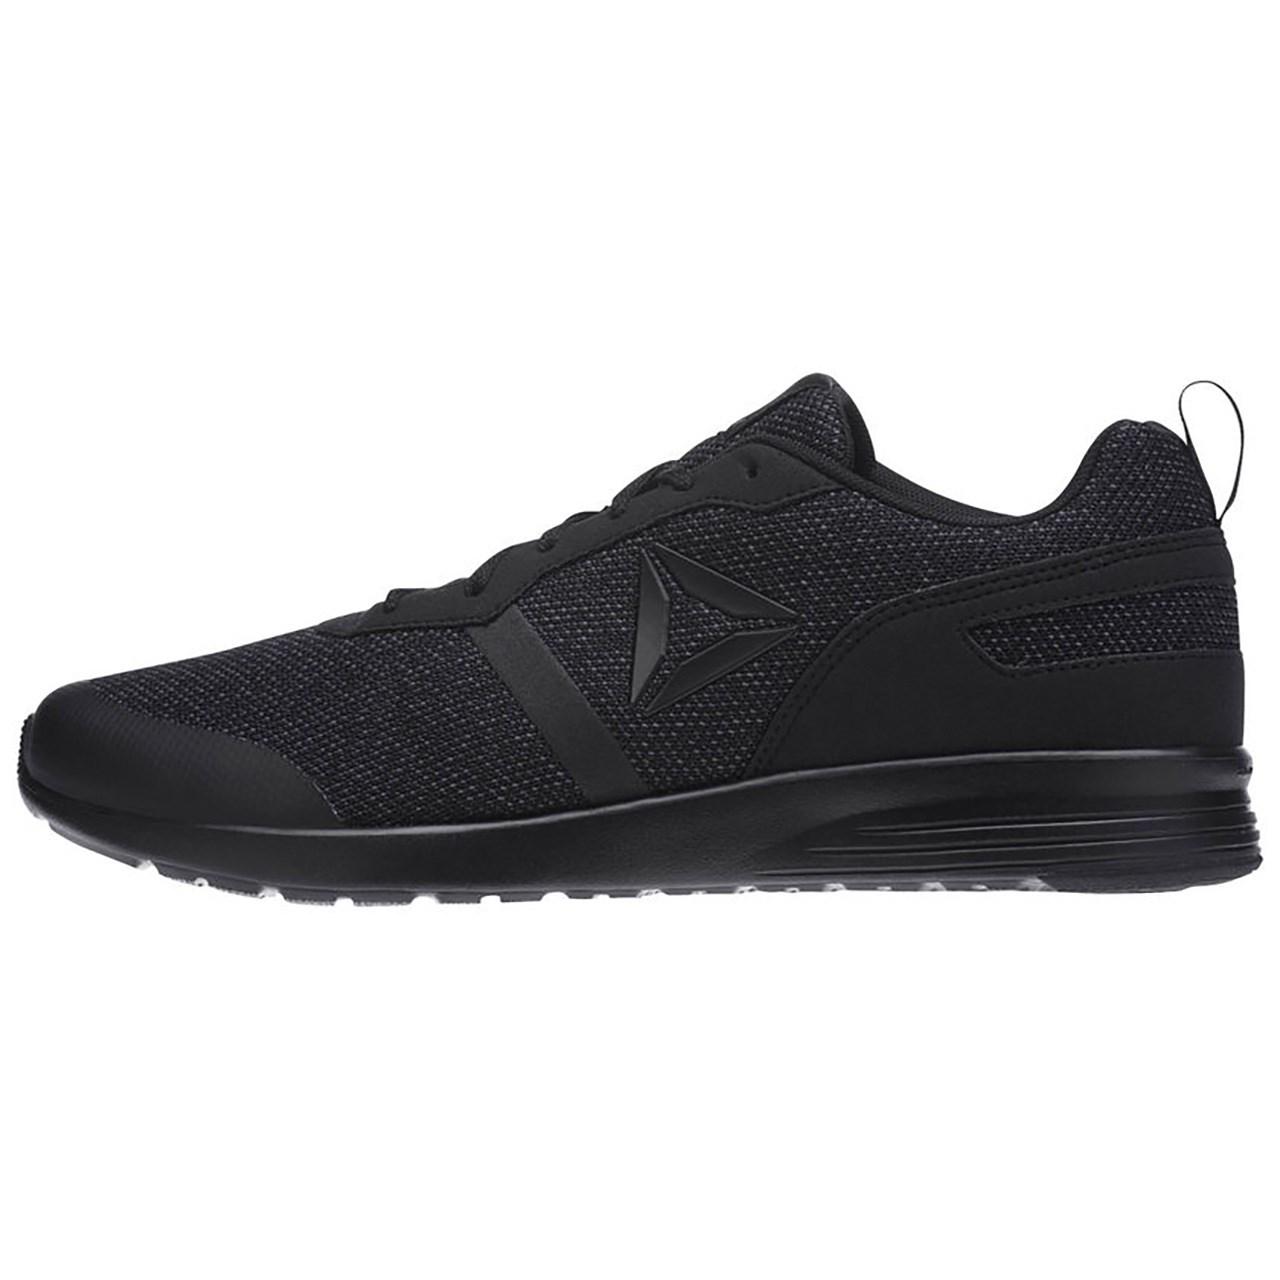 کفش مخصوص دویدن مردانه ریباک Foster Flyer